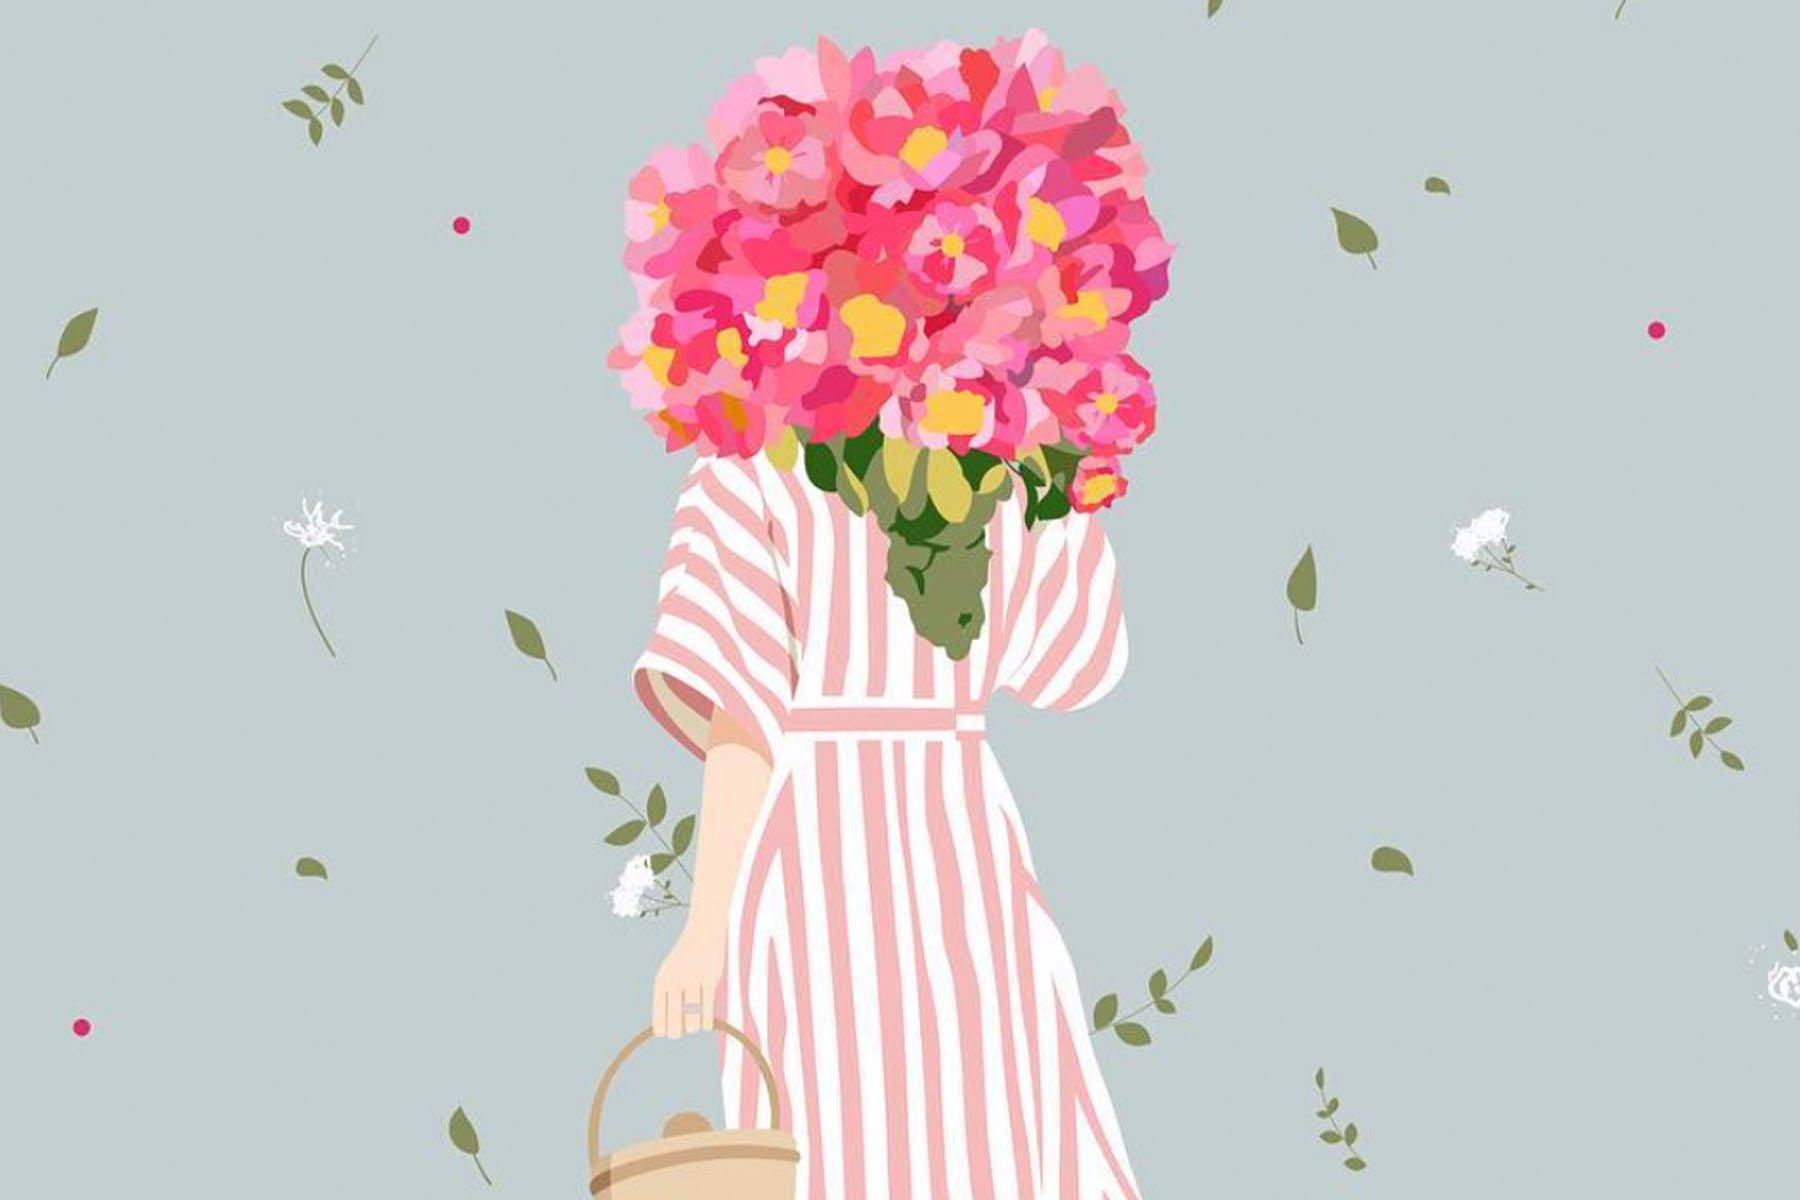 Your Cancer Season Horoscope: Enjoying the Simple Life